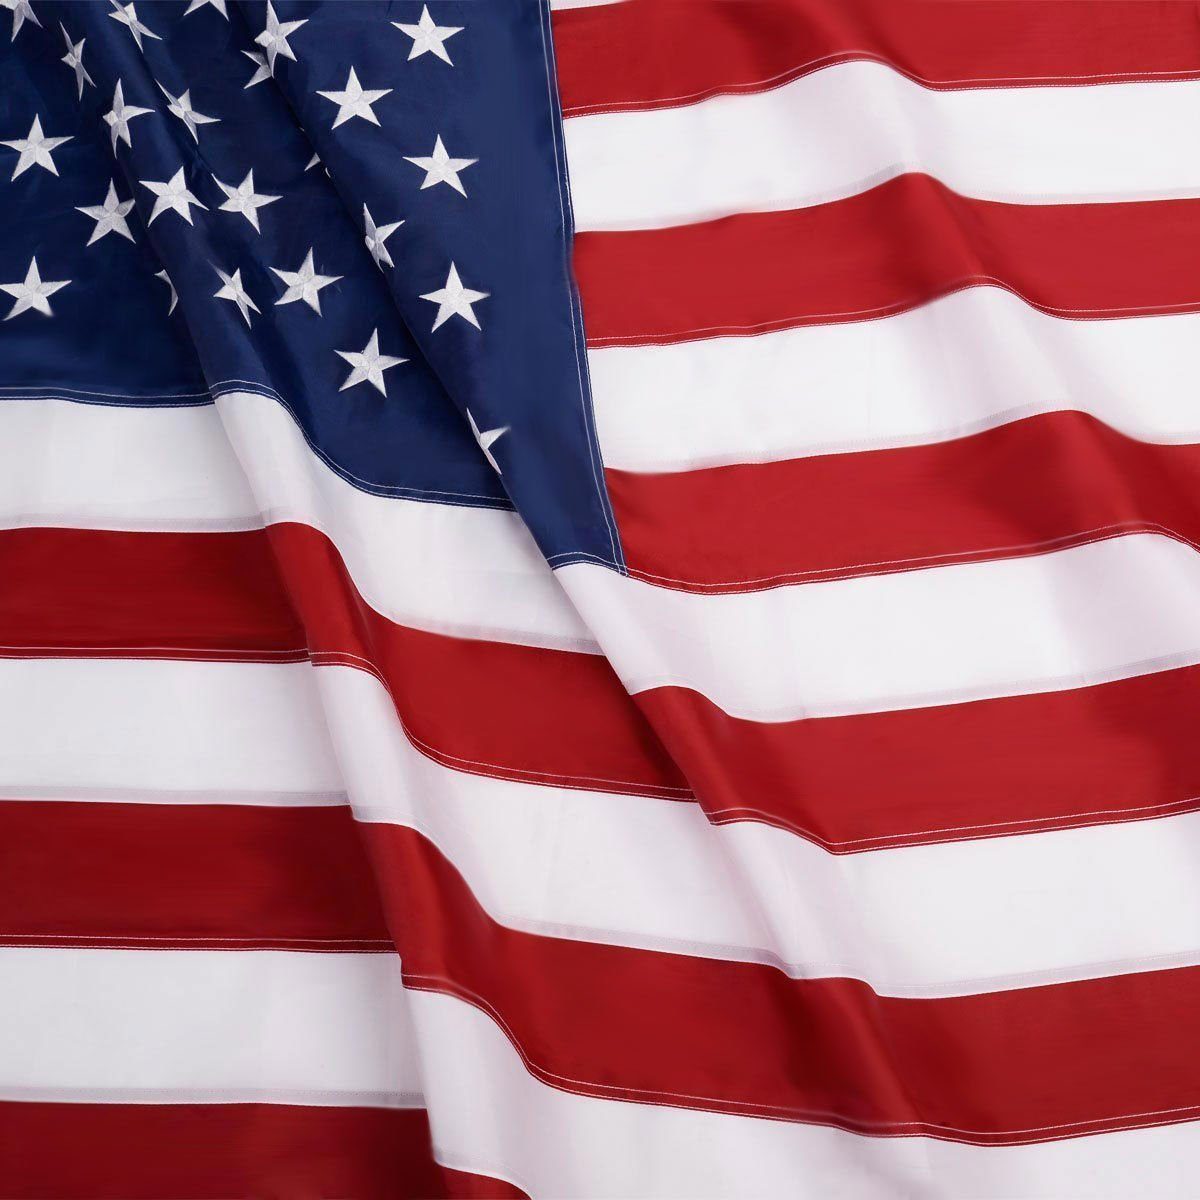 G128 American USA US Flag Nylon 5x8 Ft Embroidered Stars Sewn Stripes Brass Grommets (5X8 FT, US Flag)